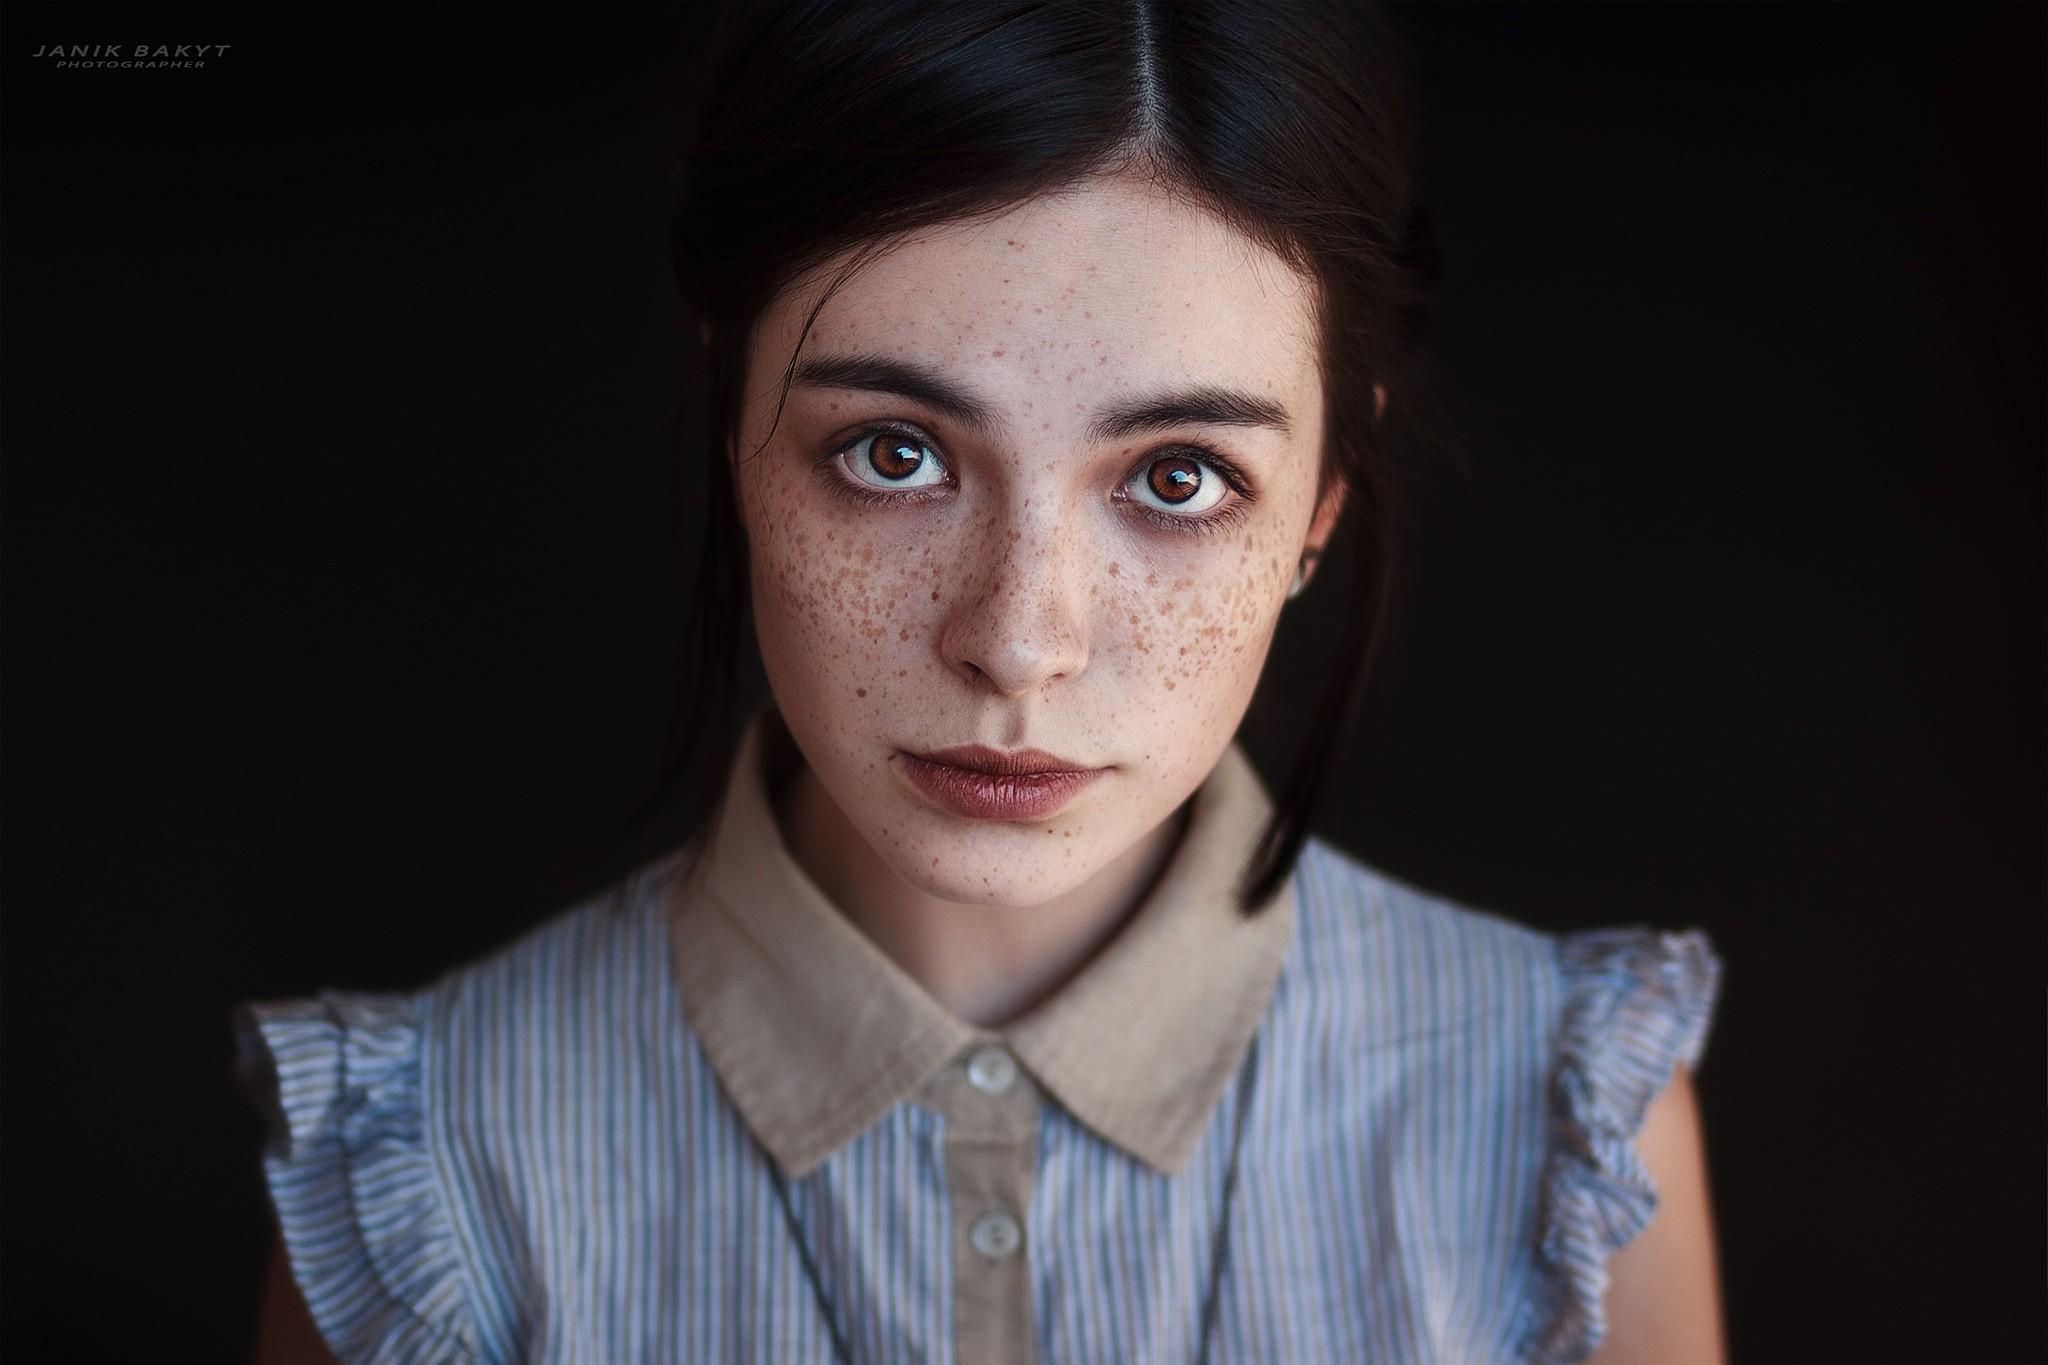 Wallpaper Face Women Model Brunette Singer Blue: Hintergrundbilder : Gesicht, Frau, Modell-, Porträt